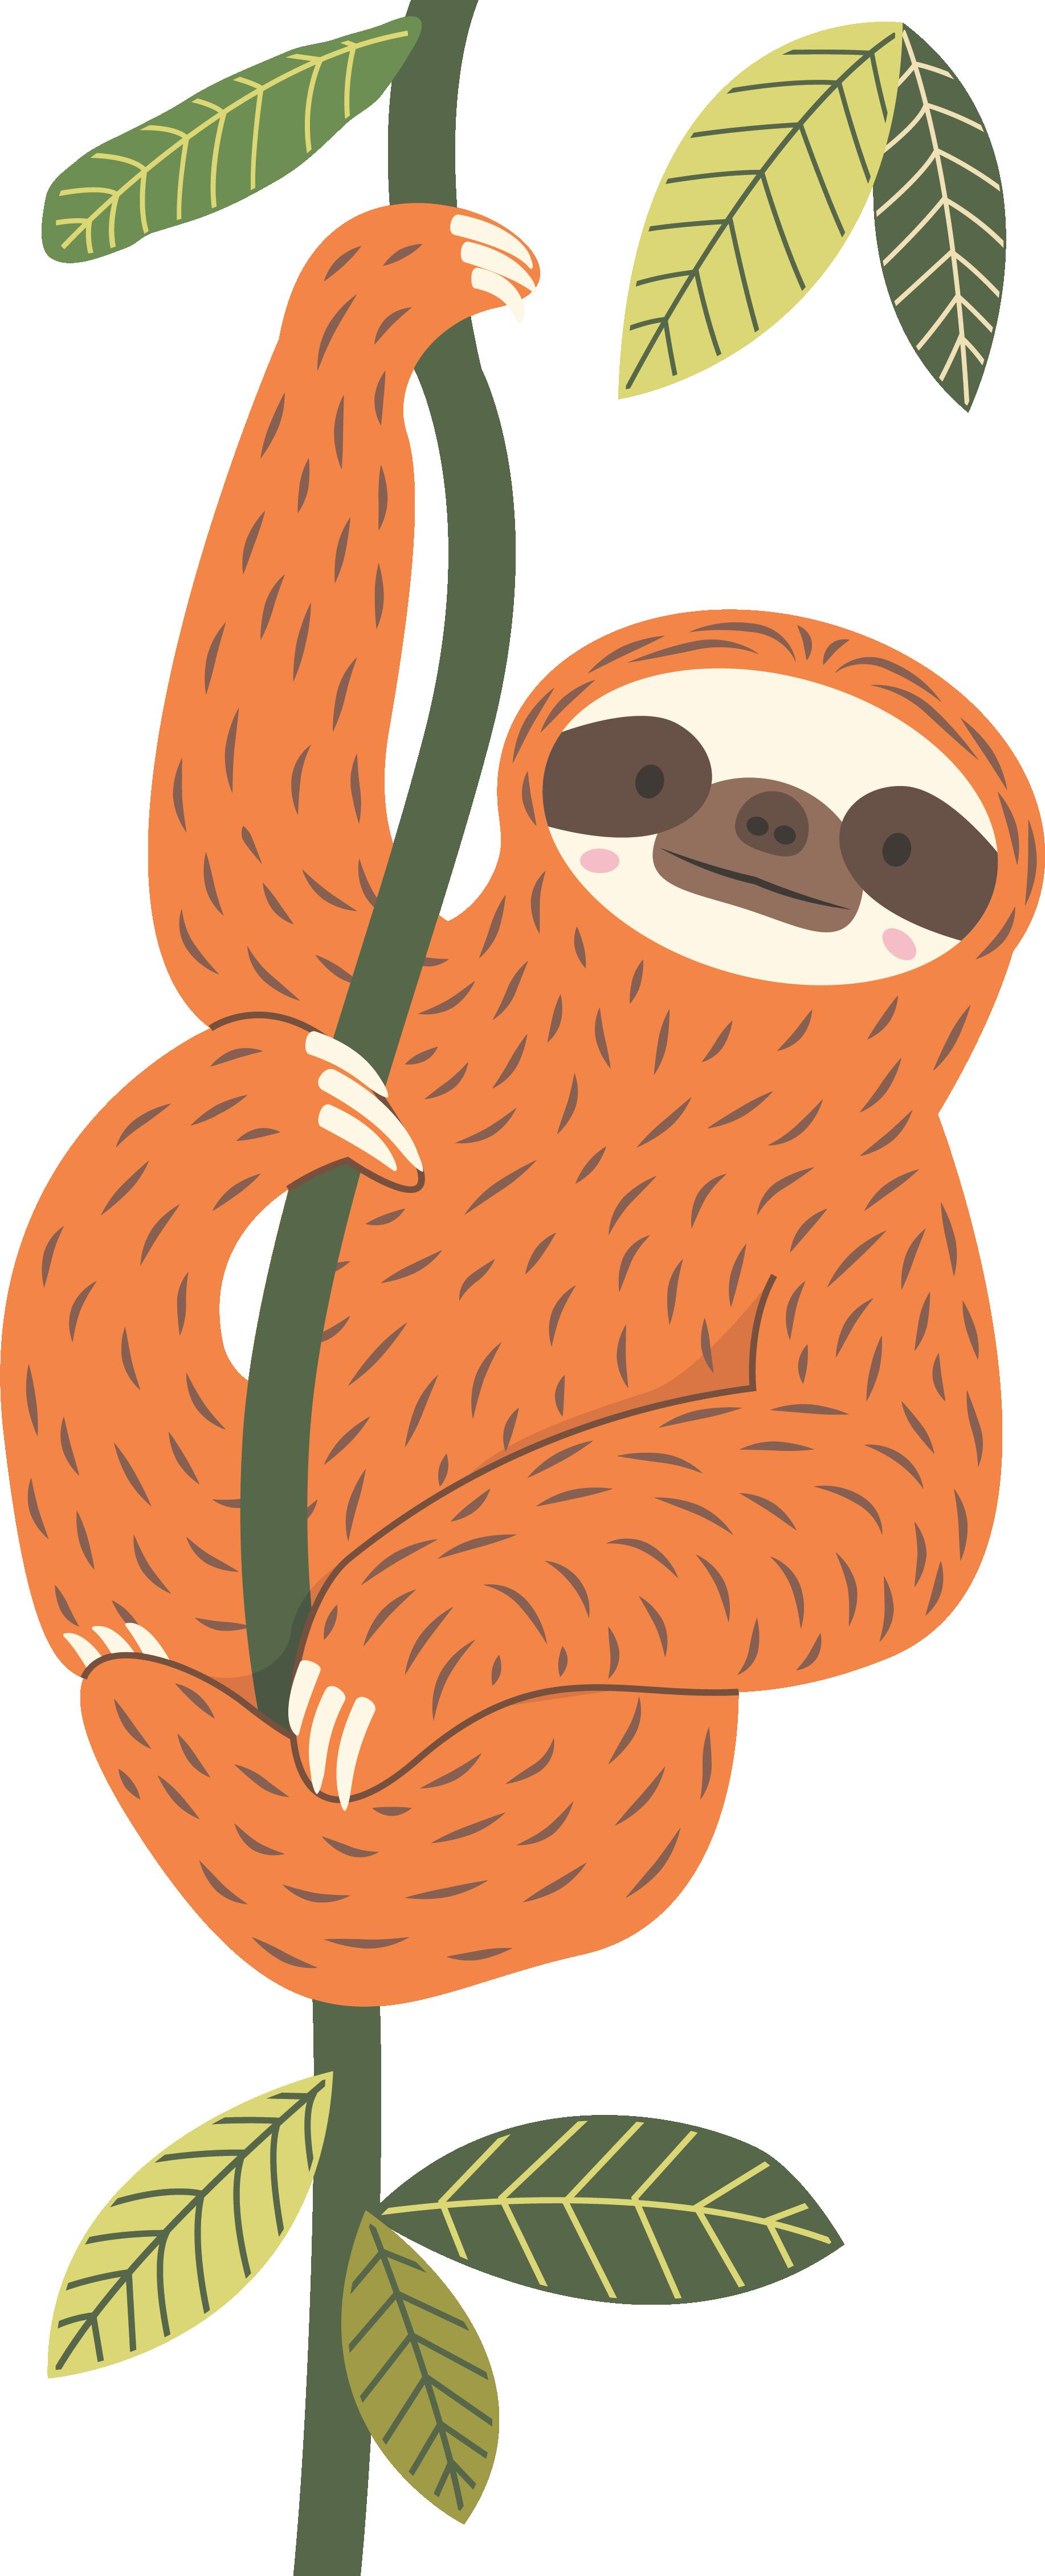 NSLW-2021-Sloth-1.png